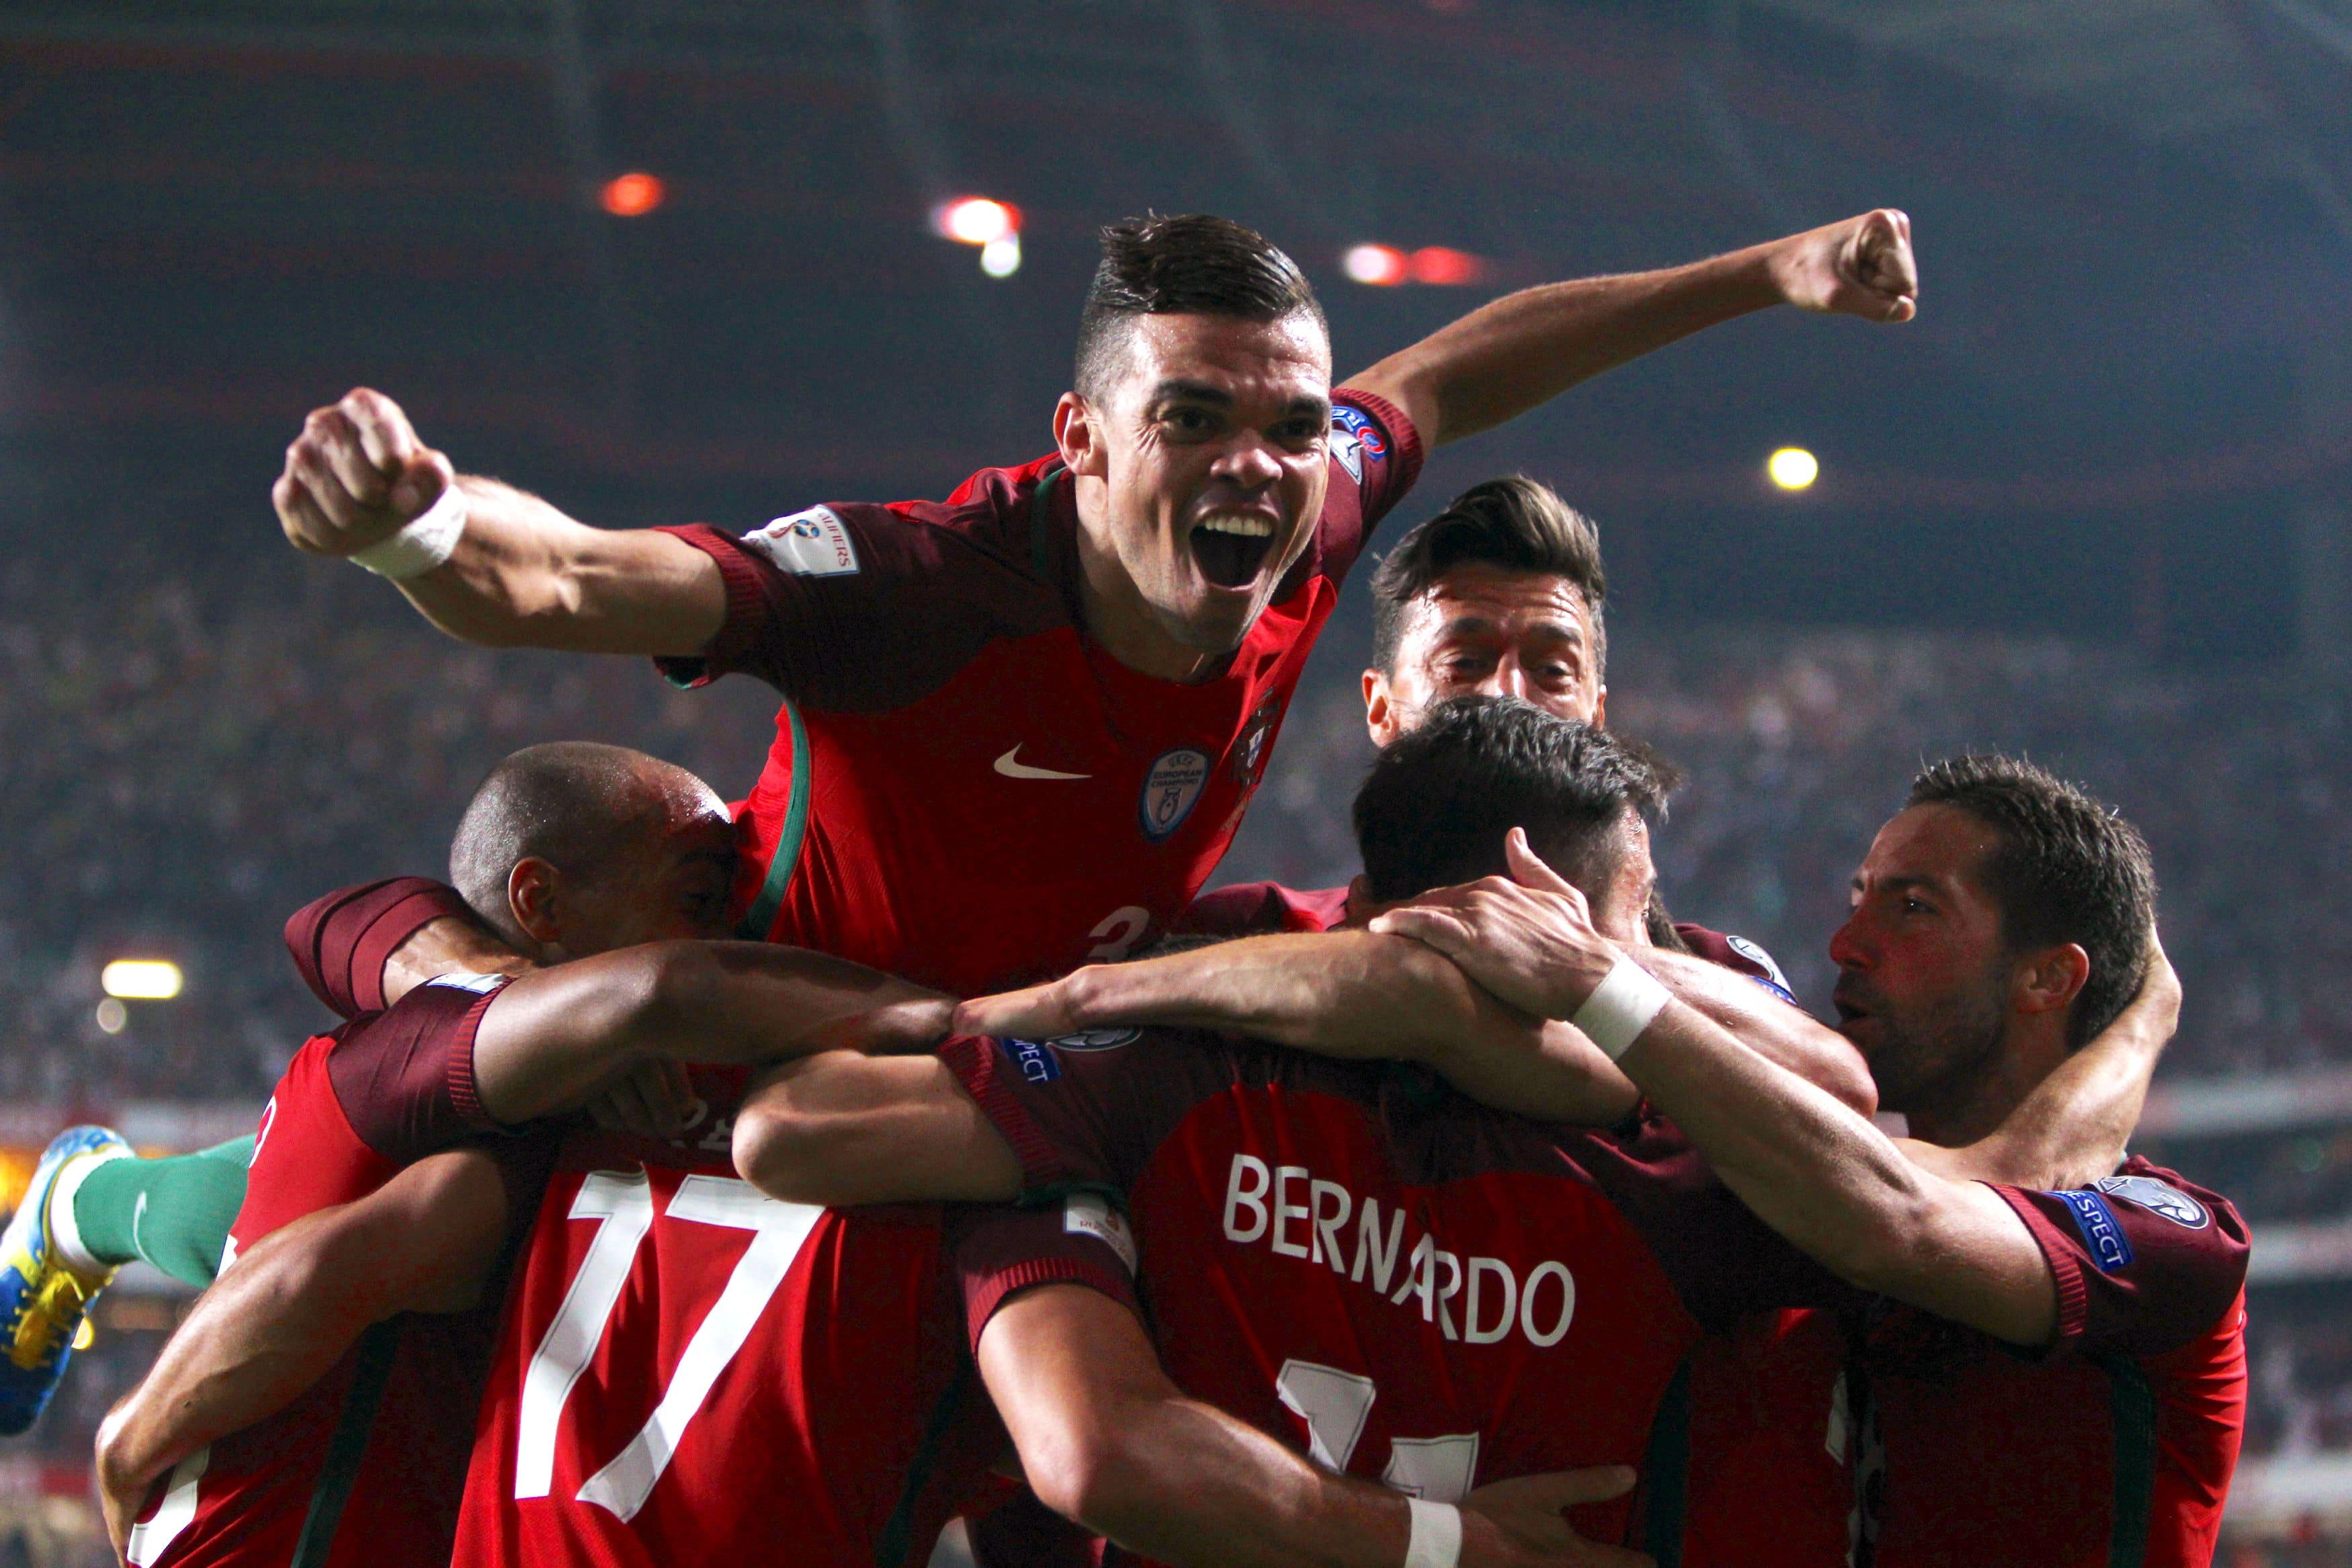 Soccer Football - 2018 World Cup Qualifications - Europe - Portugal vs Switzerland - Estadio da Luz, Lisbon, Portugal - Octob